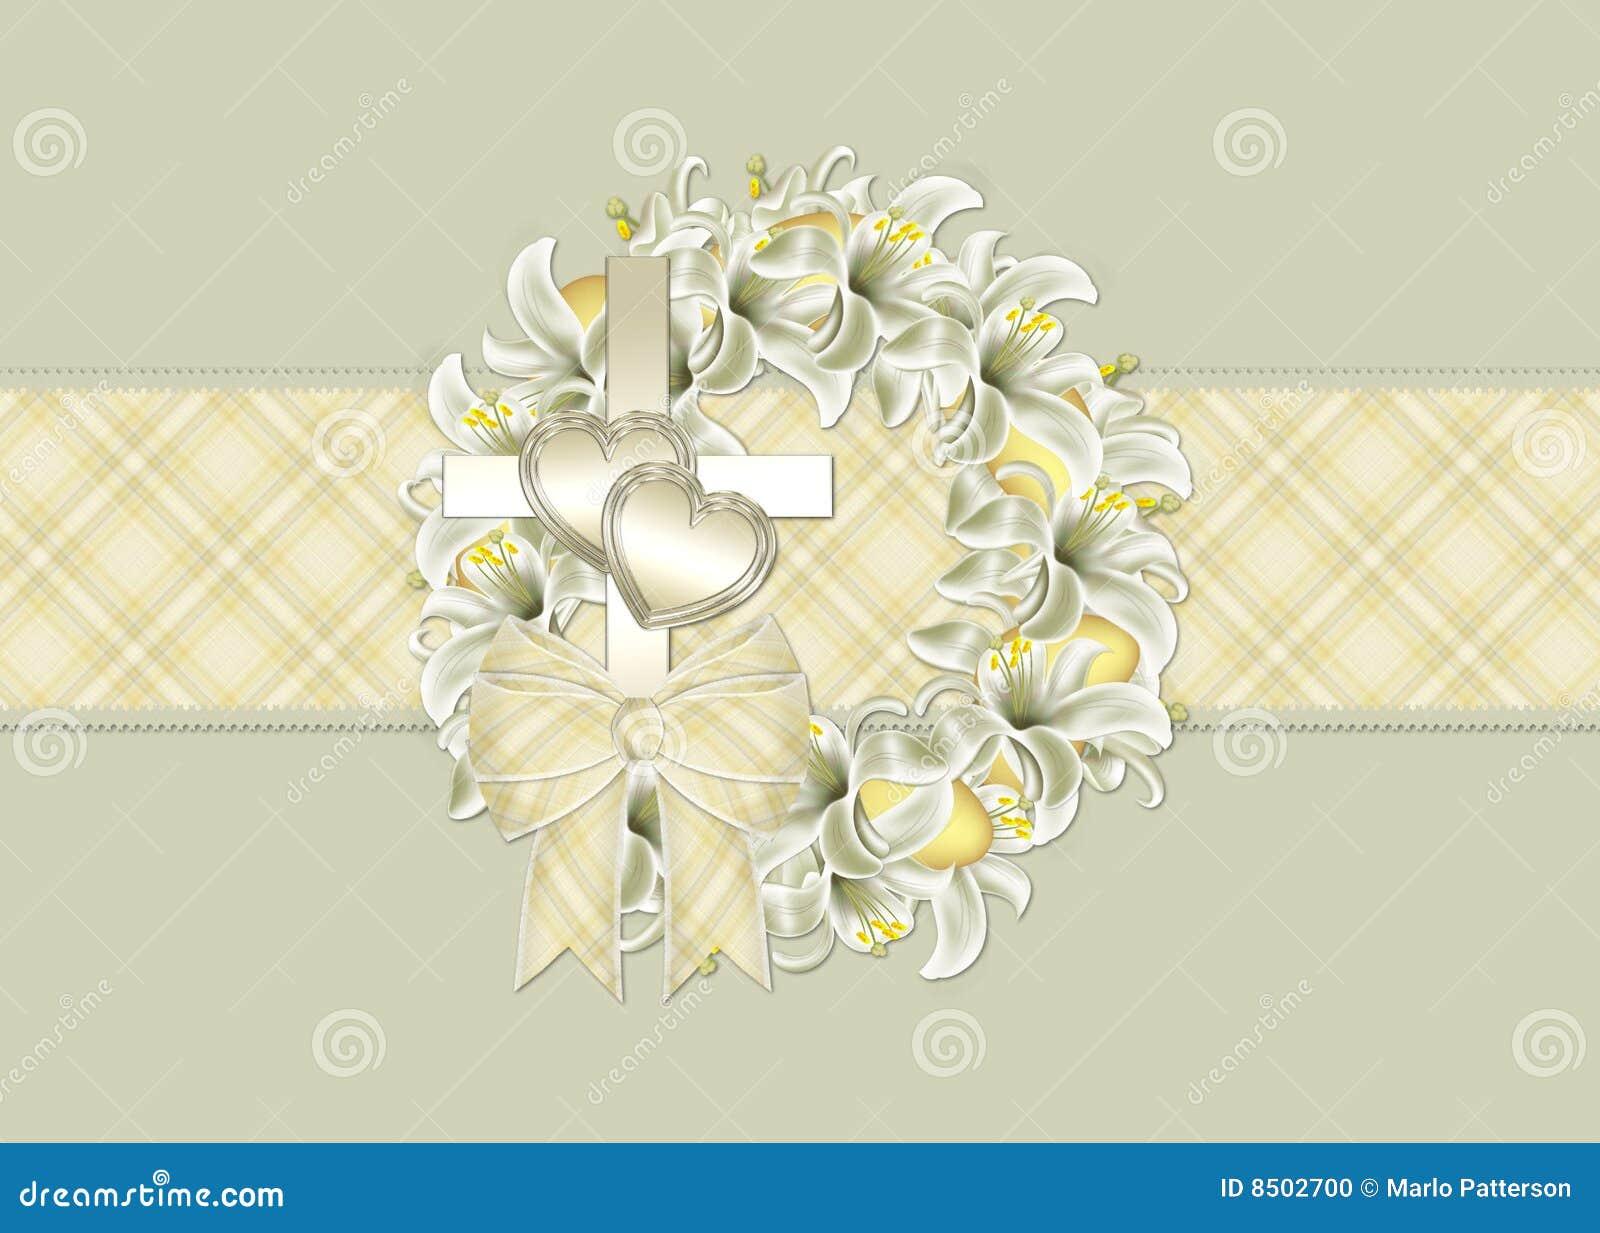 Easter Wreath Christian Greeting Card Stock Illustration